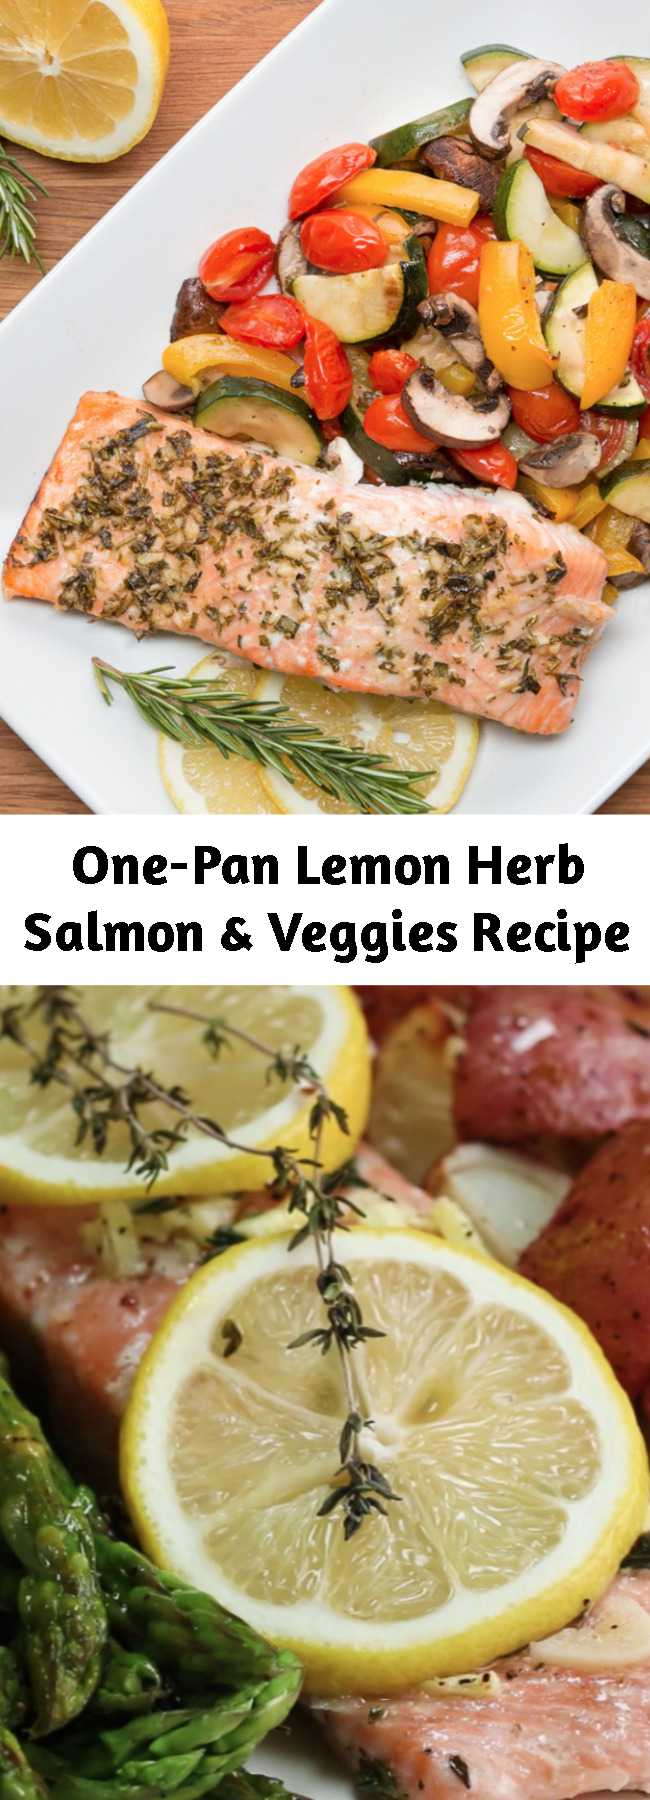 One-Pan Lemon Herb Salmon & Veggies Recipe